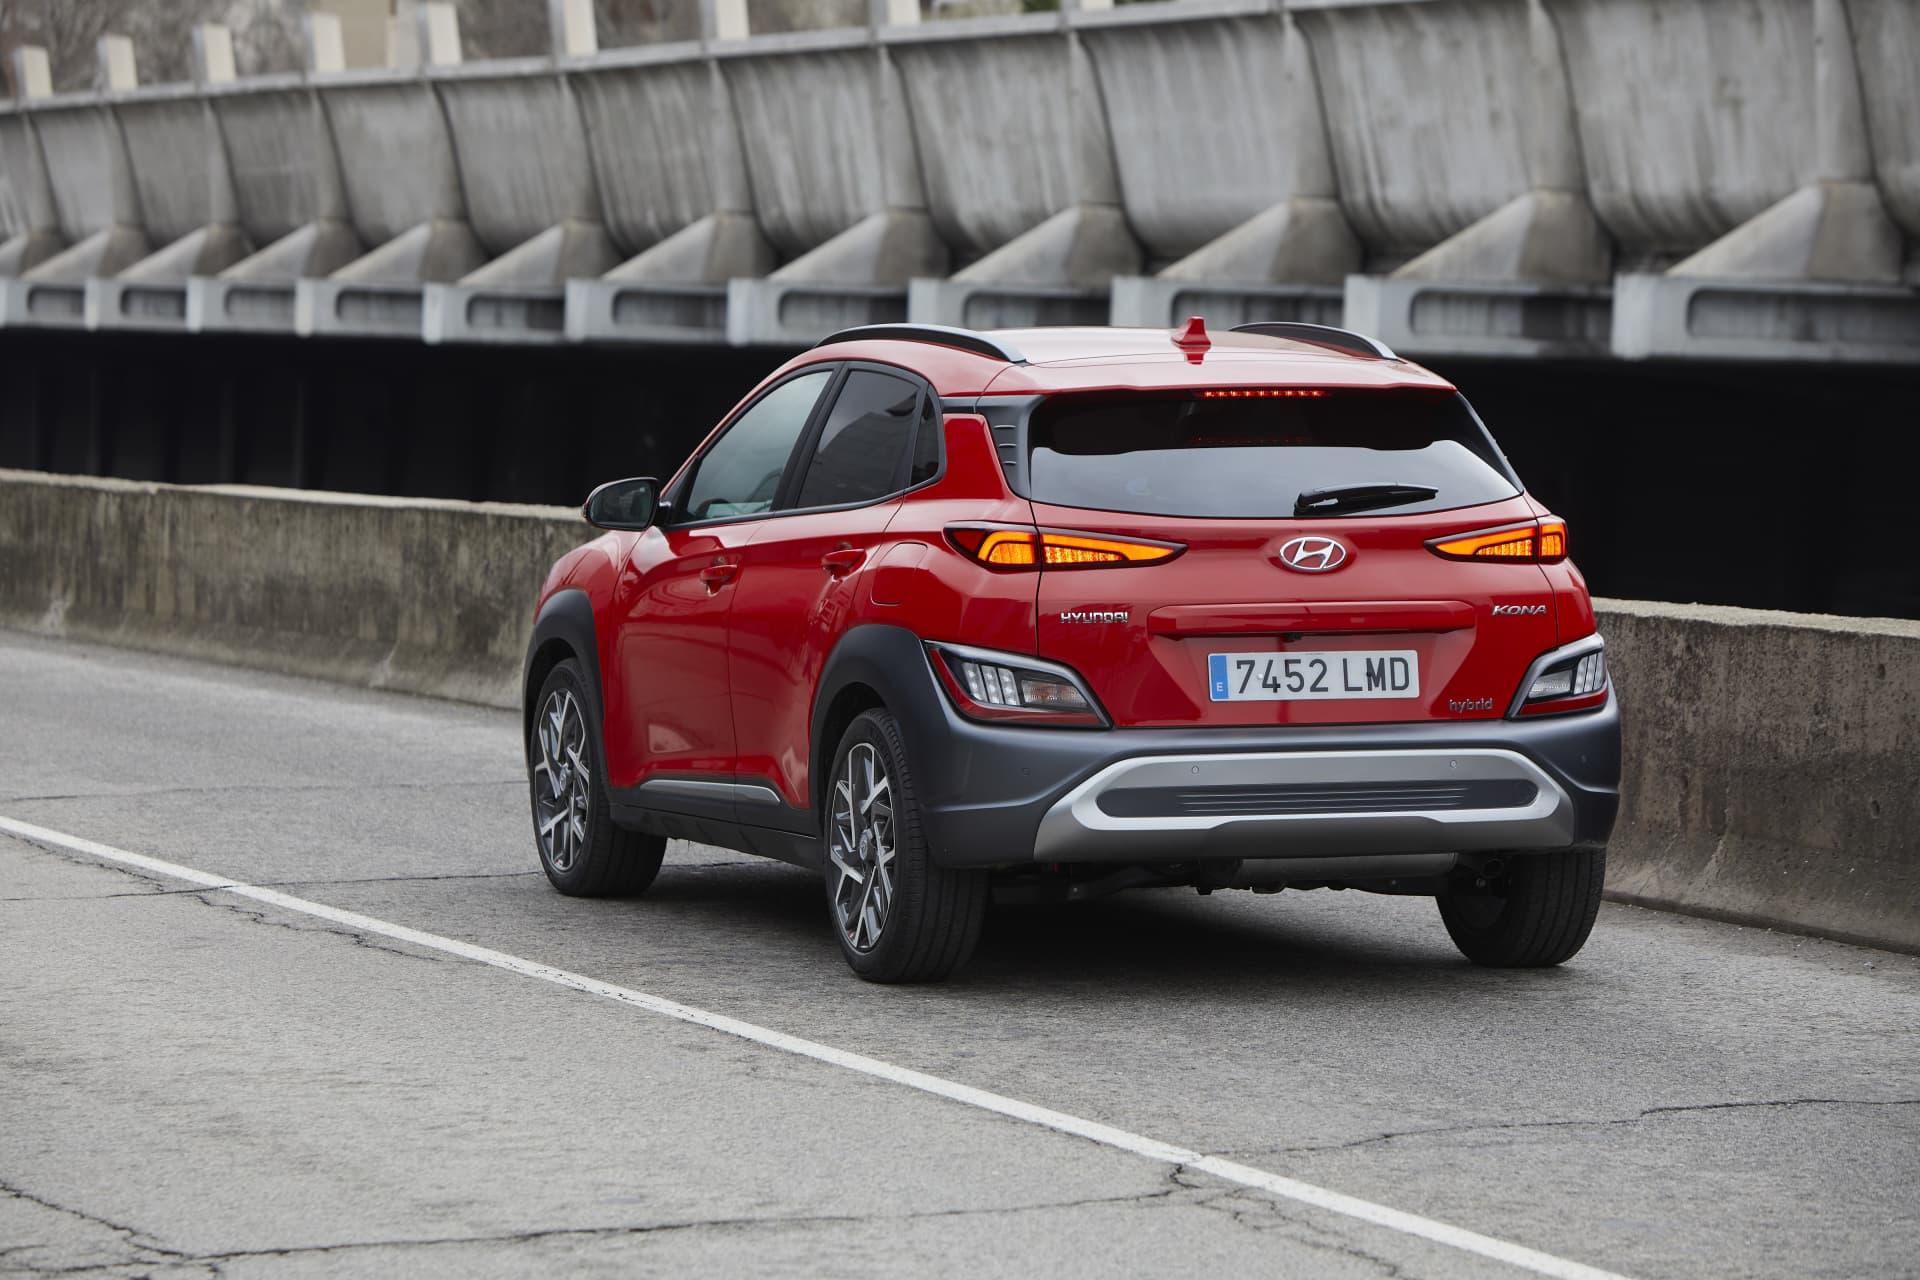 Hyundai Kona Hibrido Hev 2021 Prueba Analisis 9